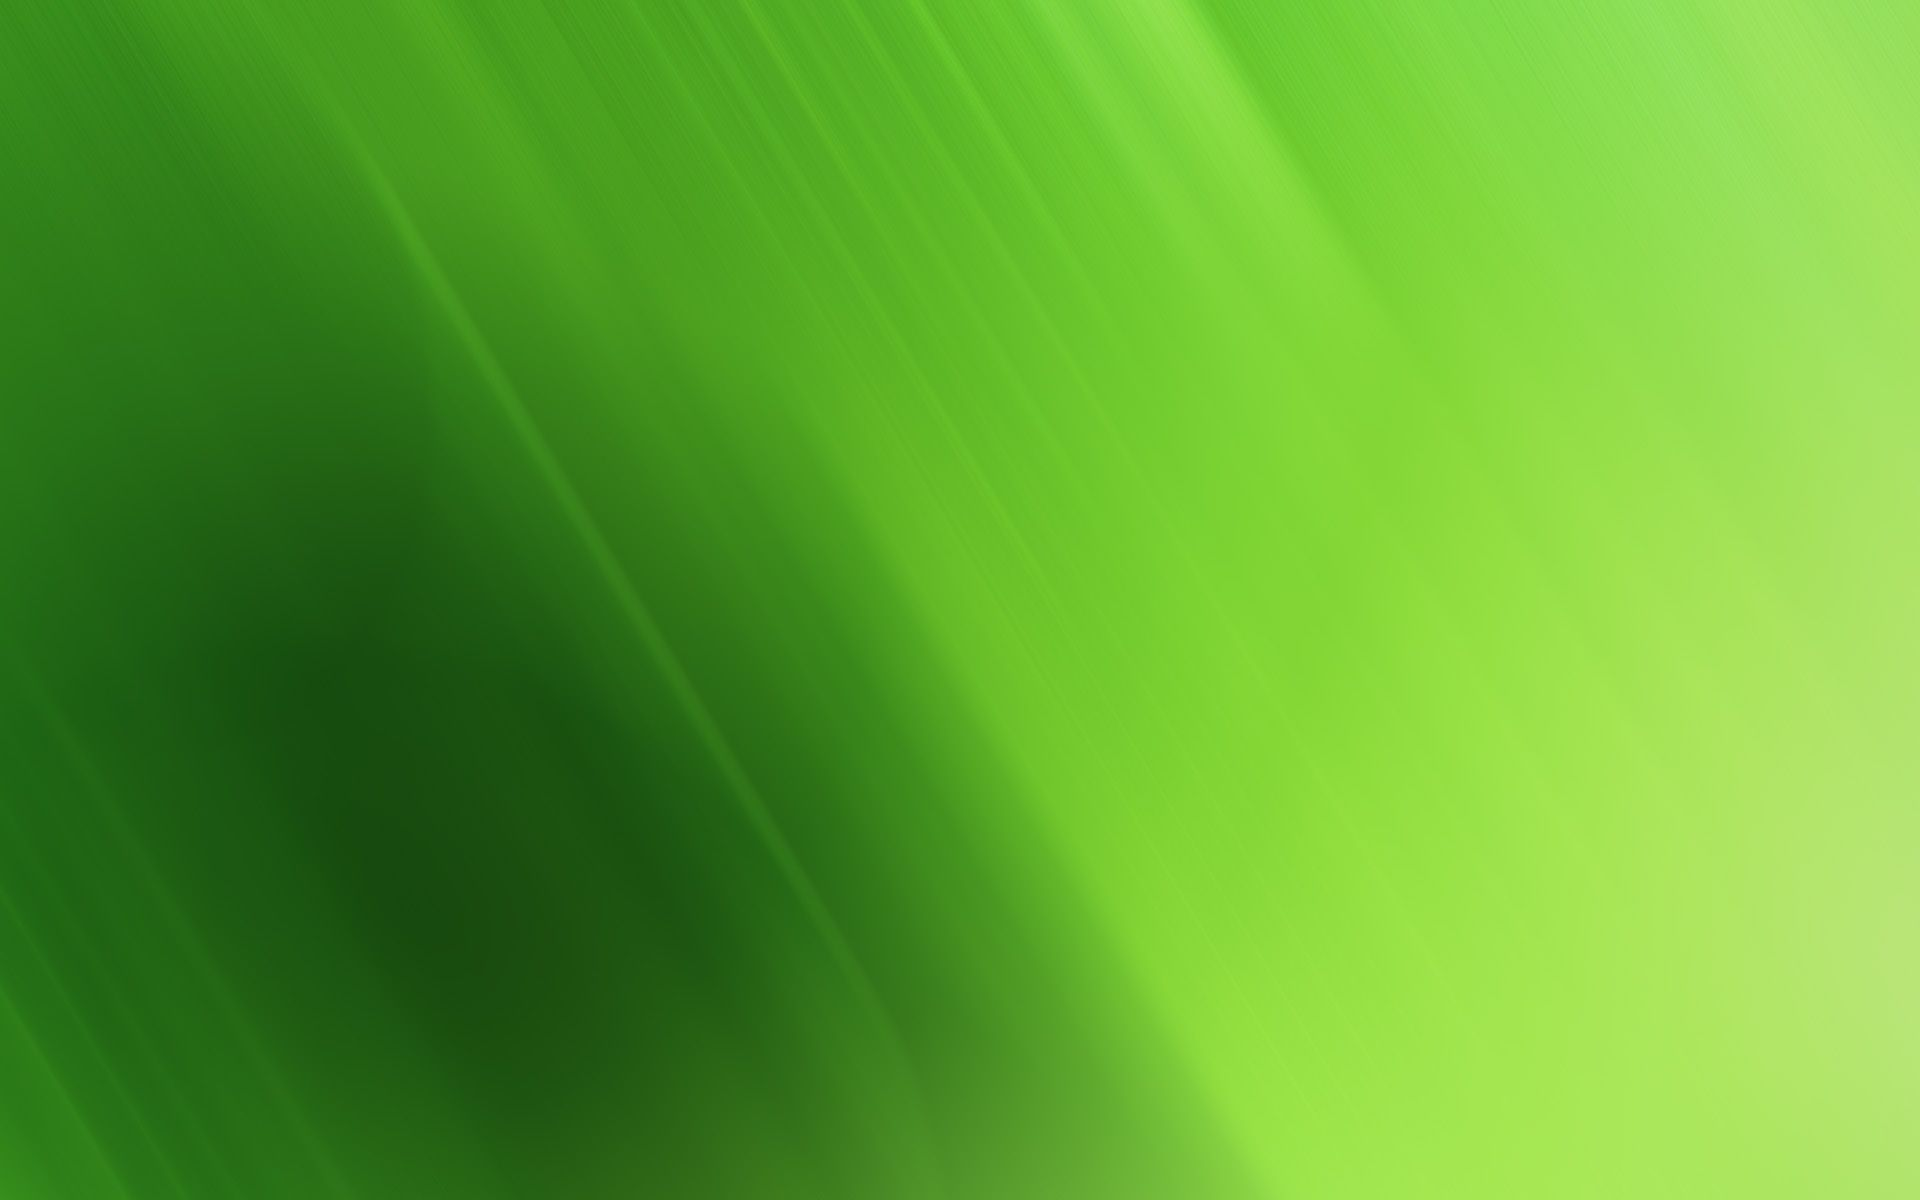 Beautiful Green Grass Field Hd Wallpapers 1920 1200 Green Hd